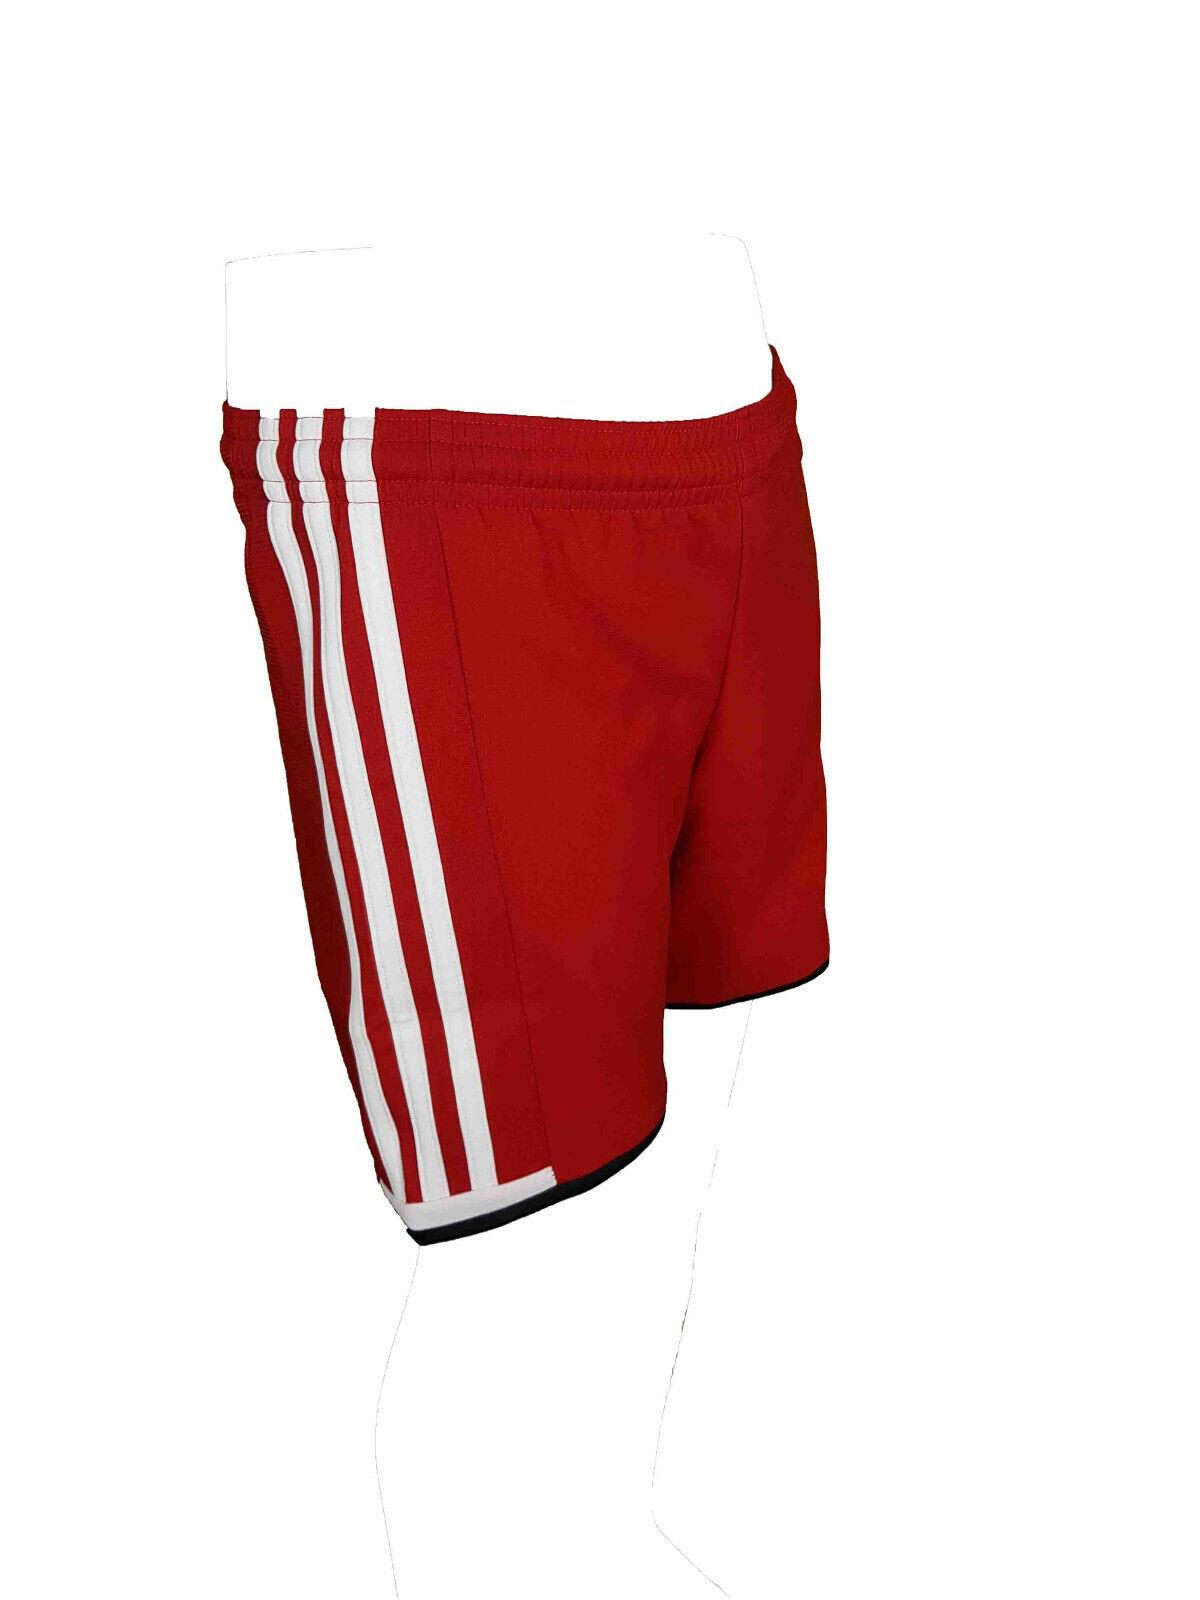 Adidas Kurze Hose 116 Test Vergleich +++ Adidas Kurze Hose